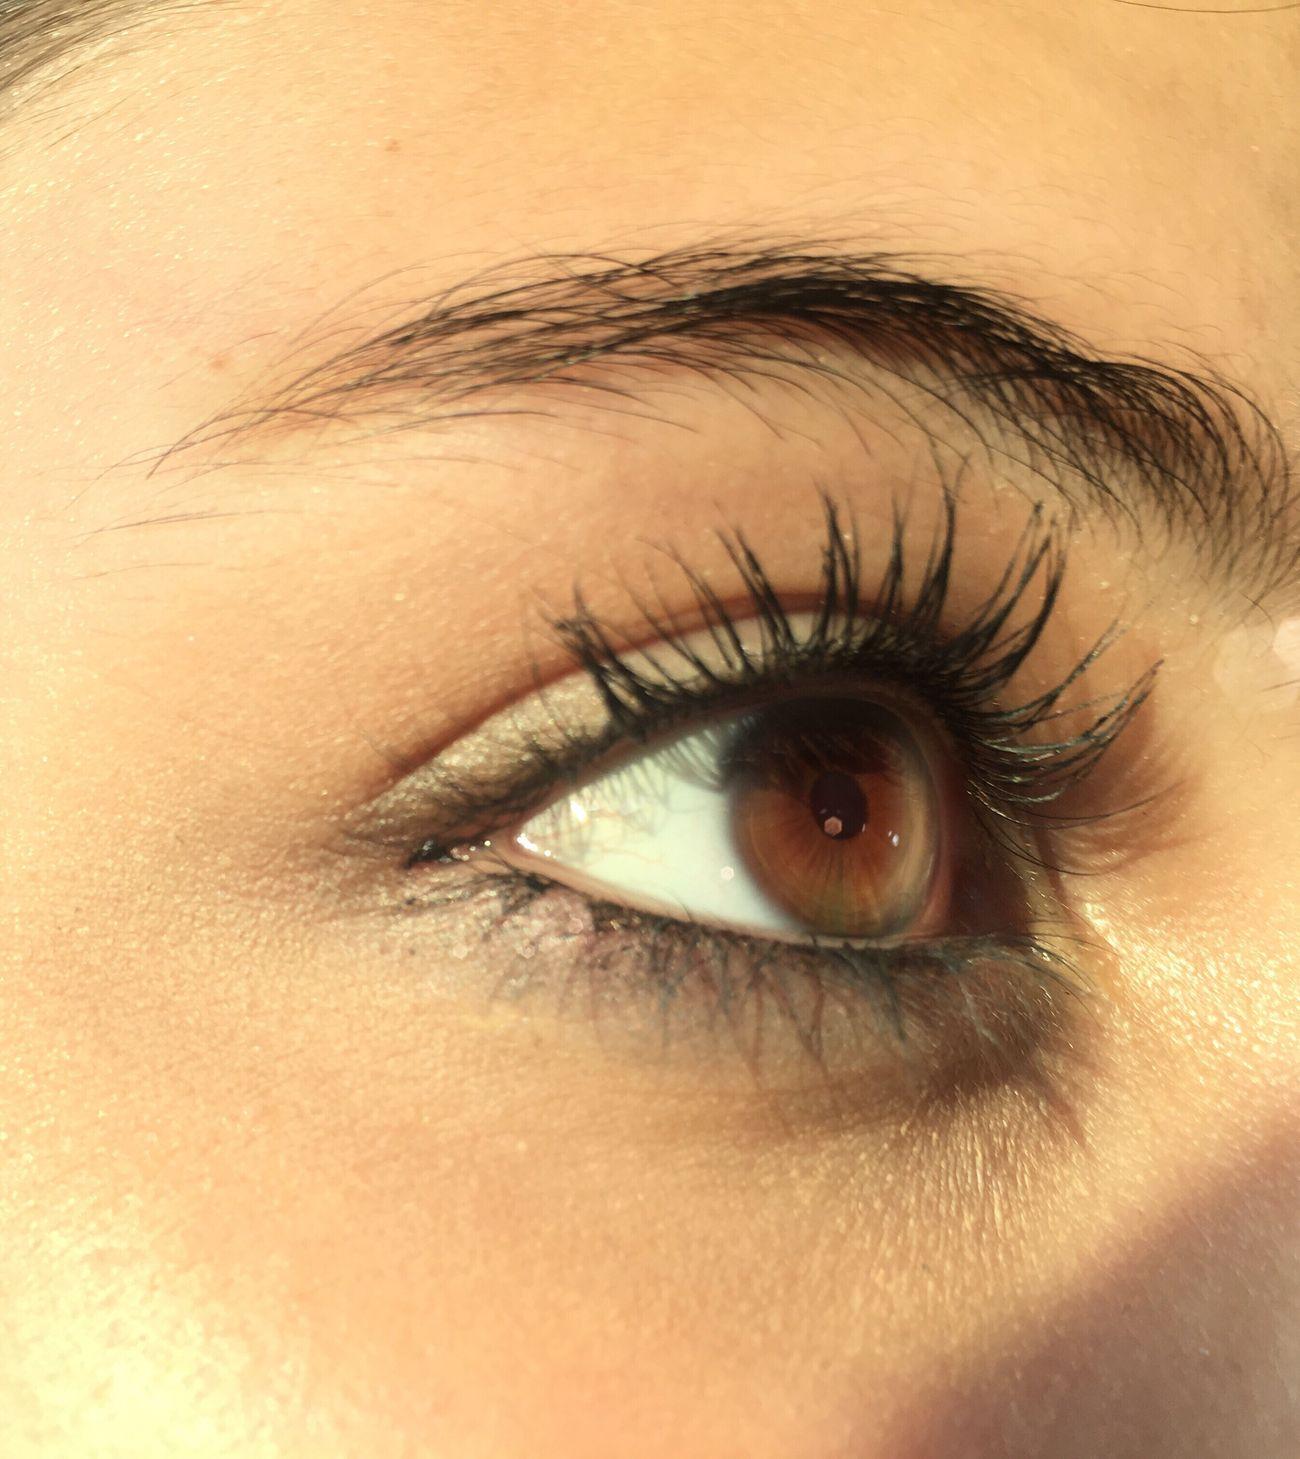 Mine🍃 Human Eye Beauty Eyelash Human Body Part Sensory Perception Eyeball Eyebrow Close-up Eyeshadow Beautiful Woman Iris - Eye Women Eyesight Vision Mascara